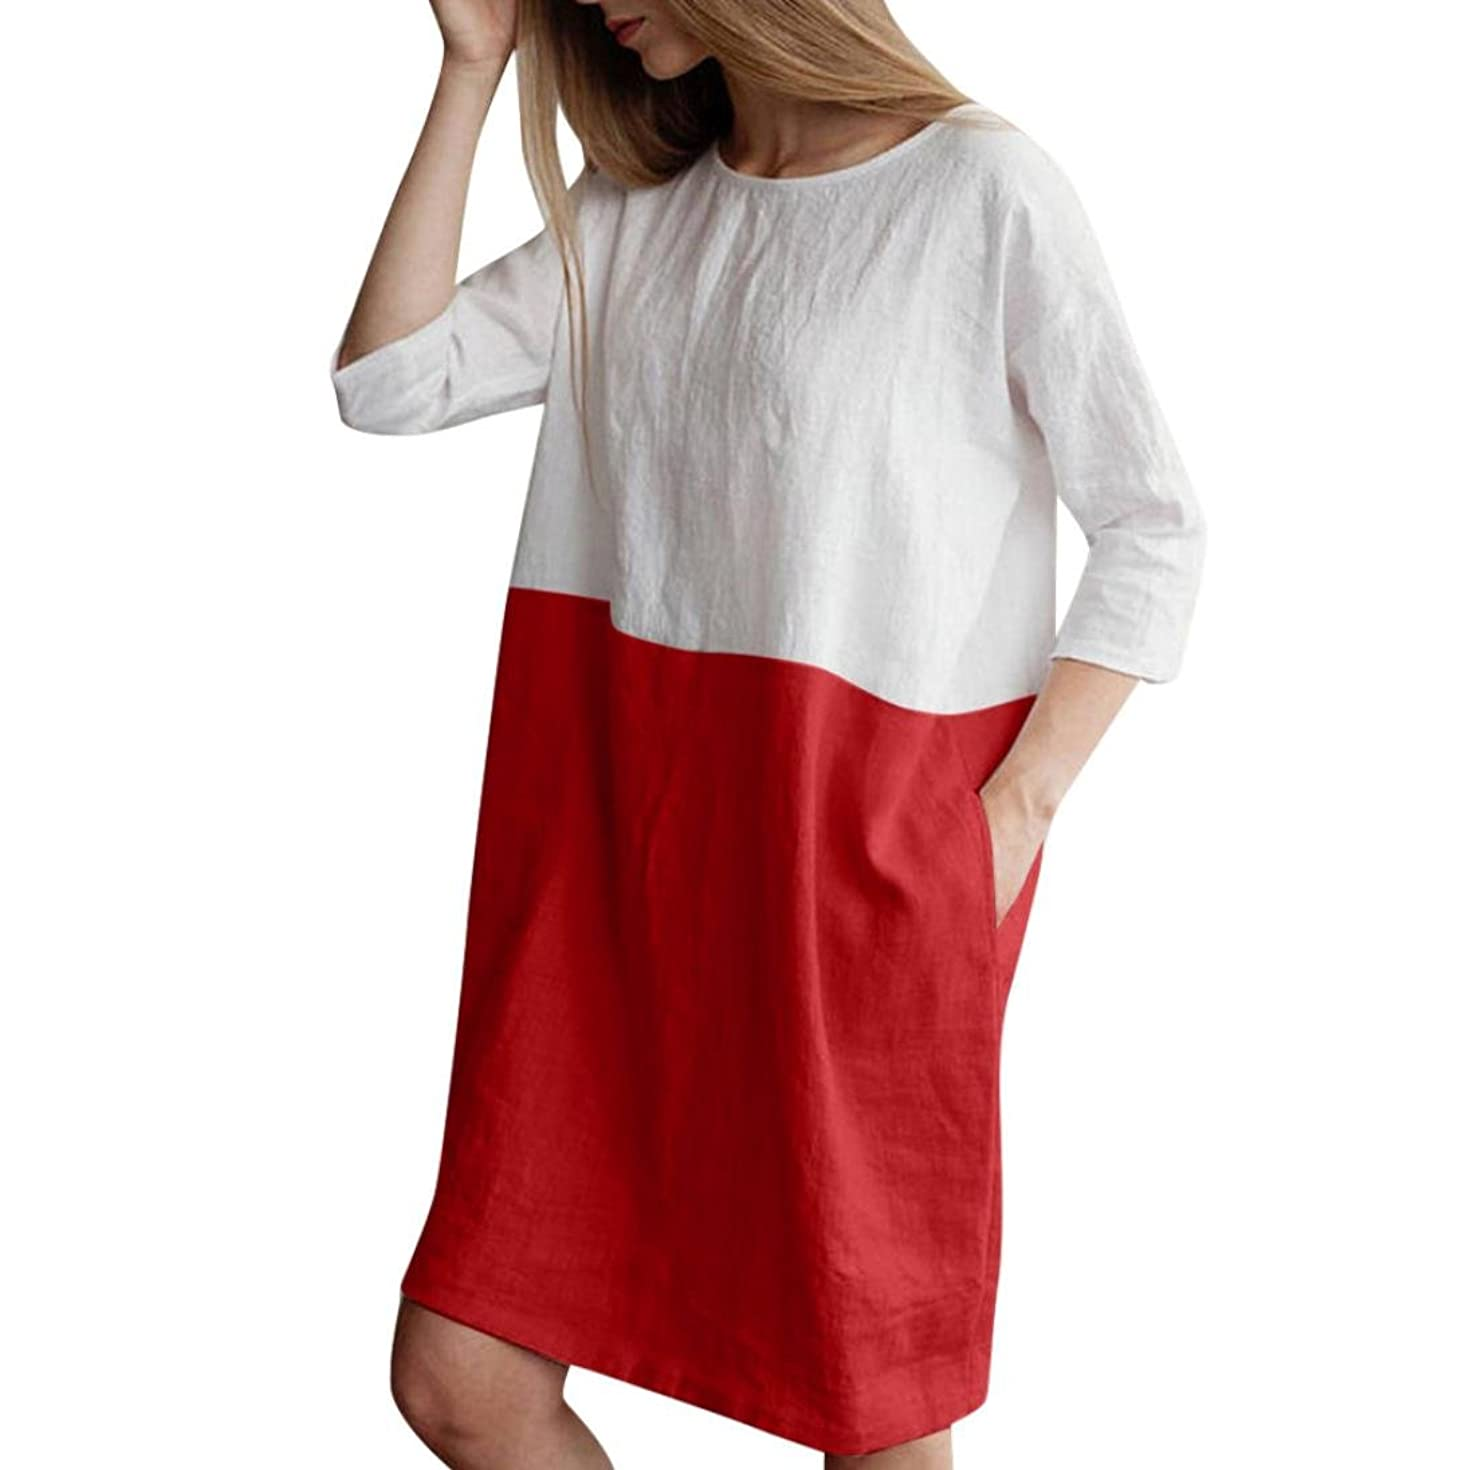 Vicbovo Clearance Sale!! Cotton Linen Dress, Women Patchwork 3/4 Sleeve Loose Cotton Linen Tunic Top Shirt Dresses